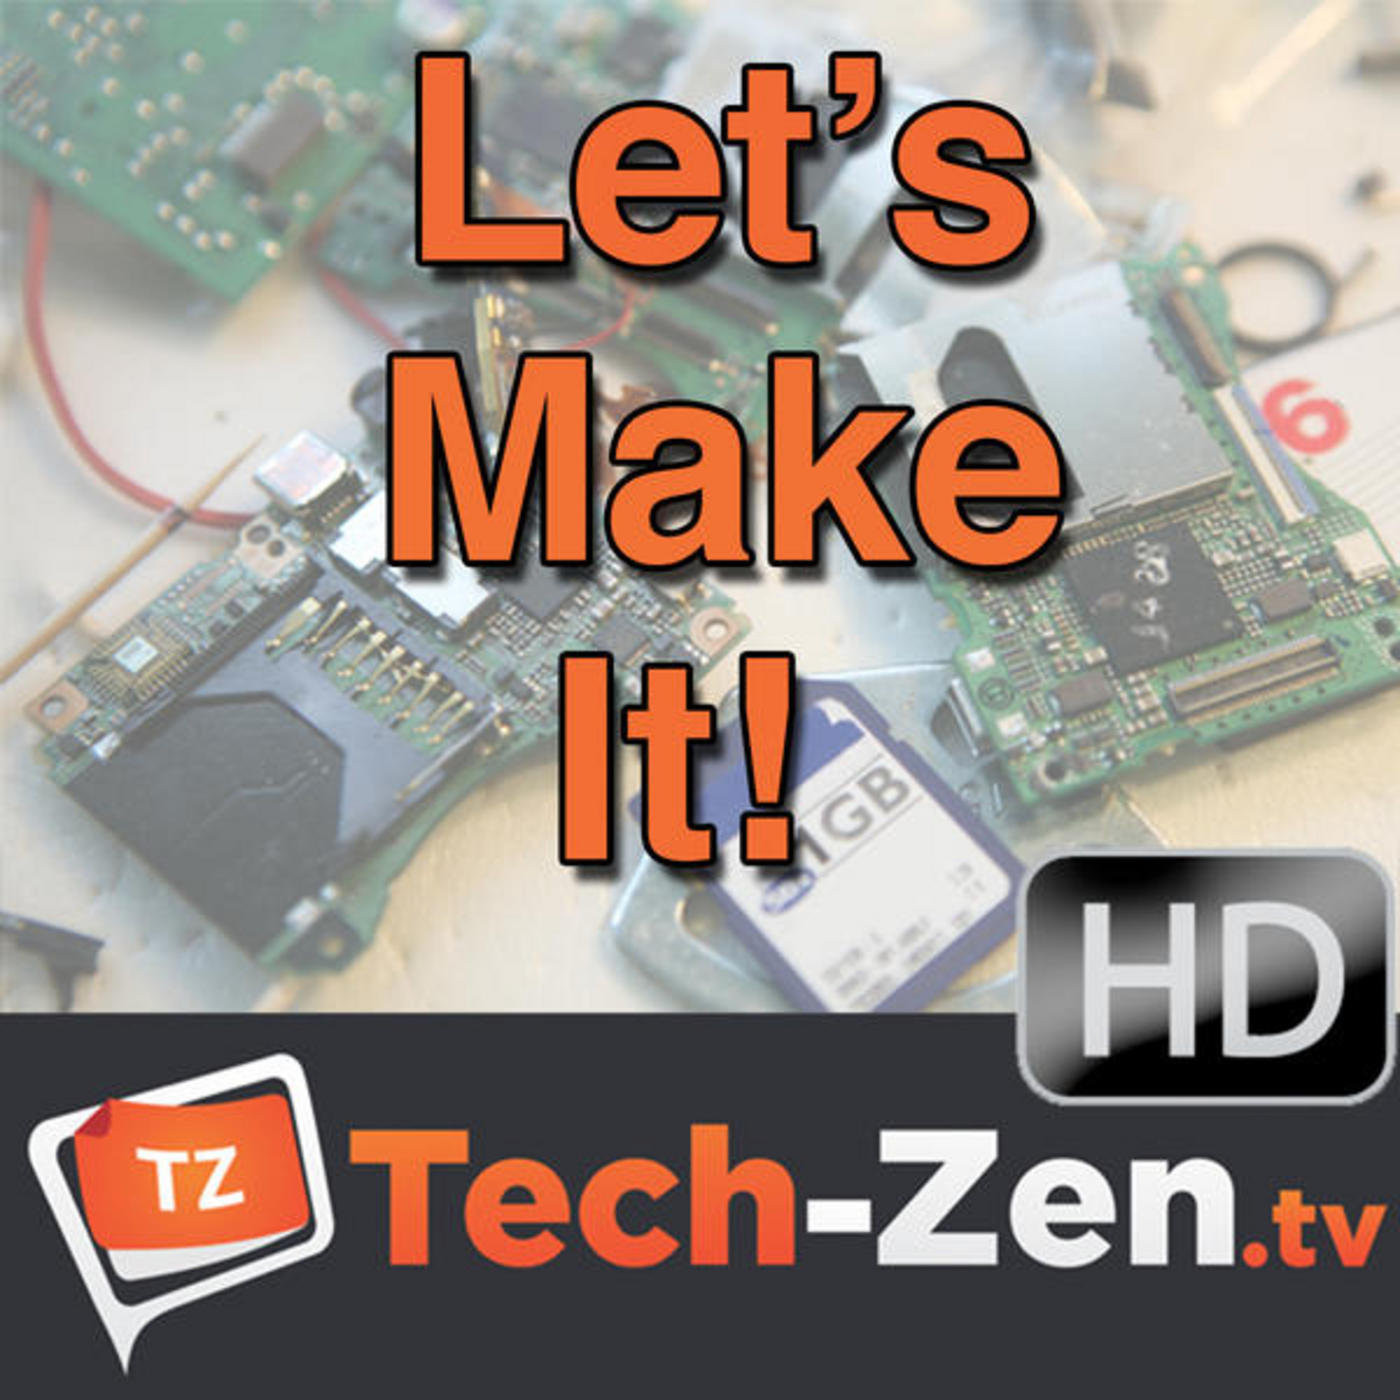 Project Updates, Will Bee Fun - Tech-Zen.tv